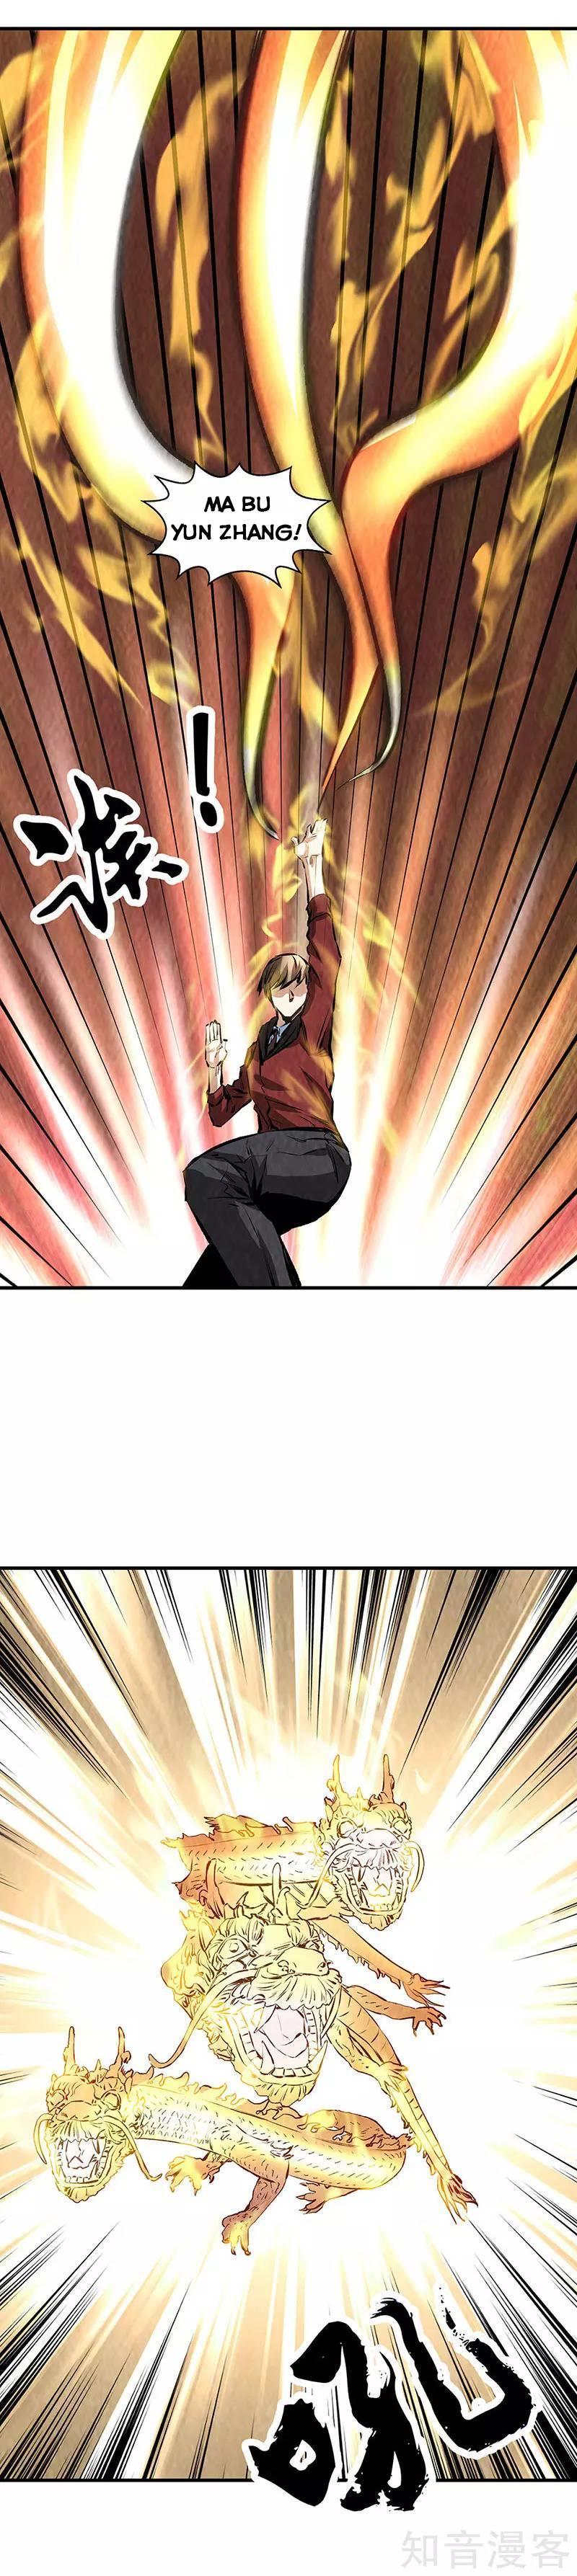 I Was Trash Chapter 216 page 2 - Mangakakalot